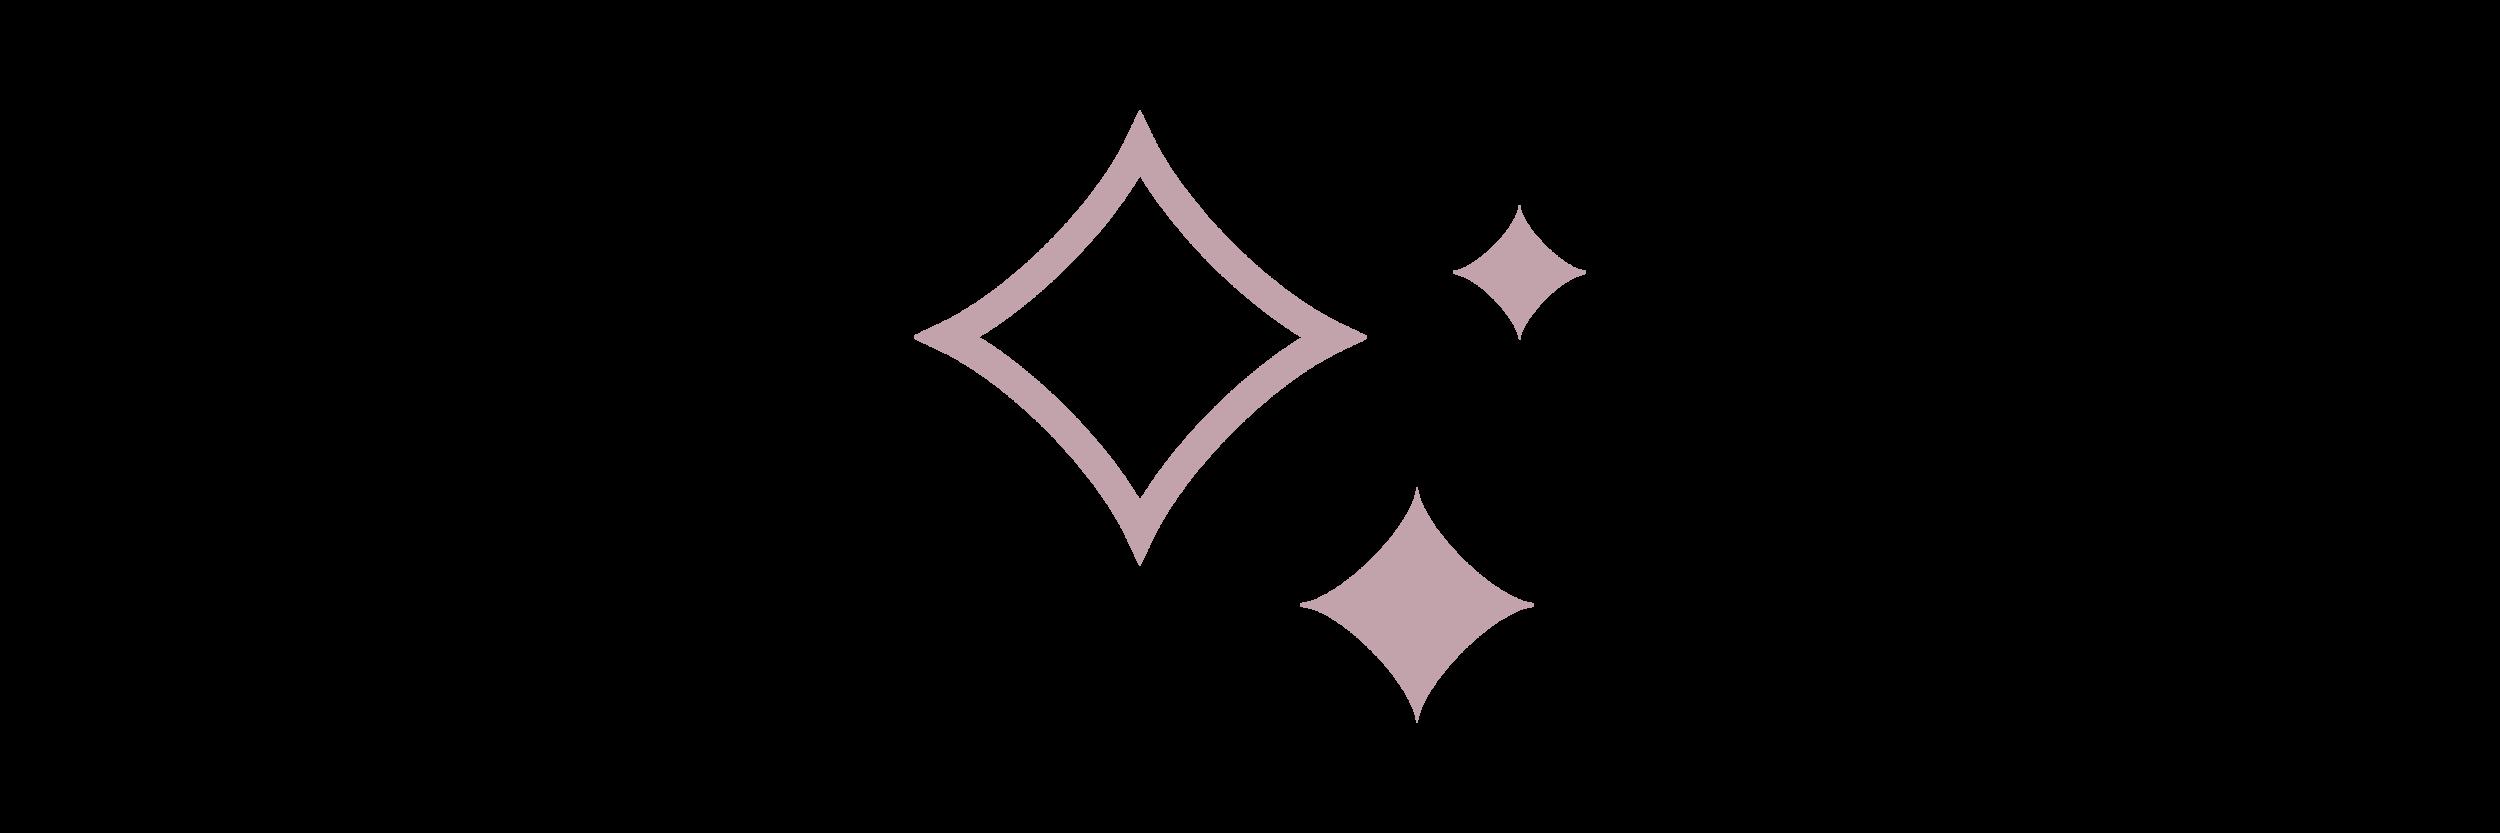 Lilac Diamond.png